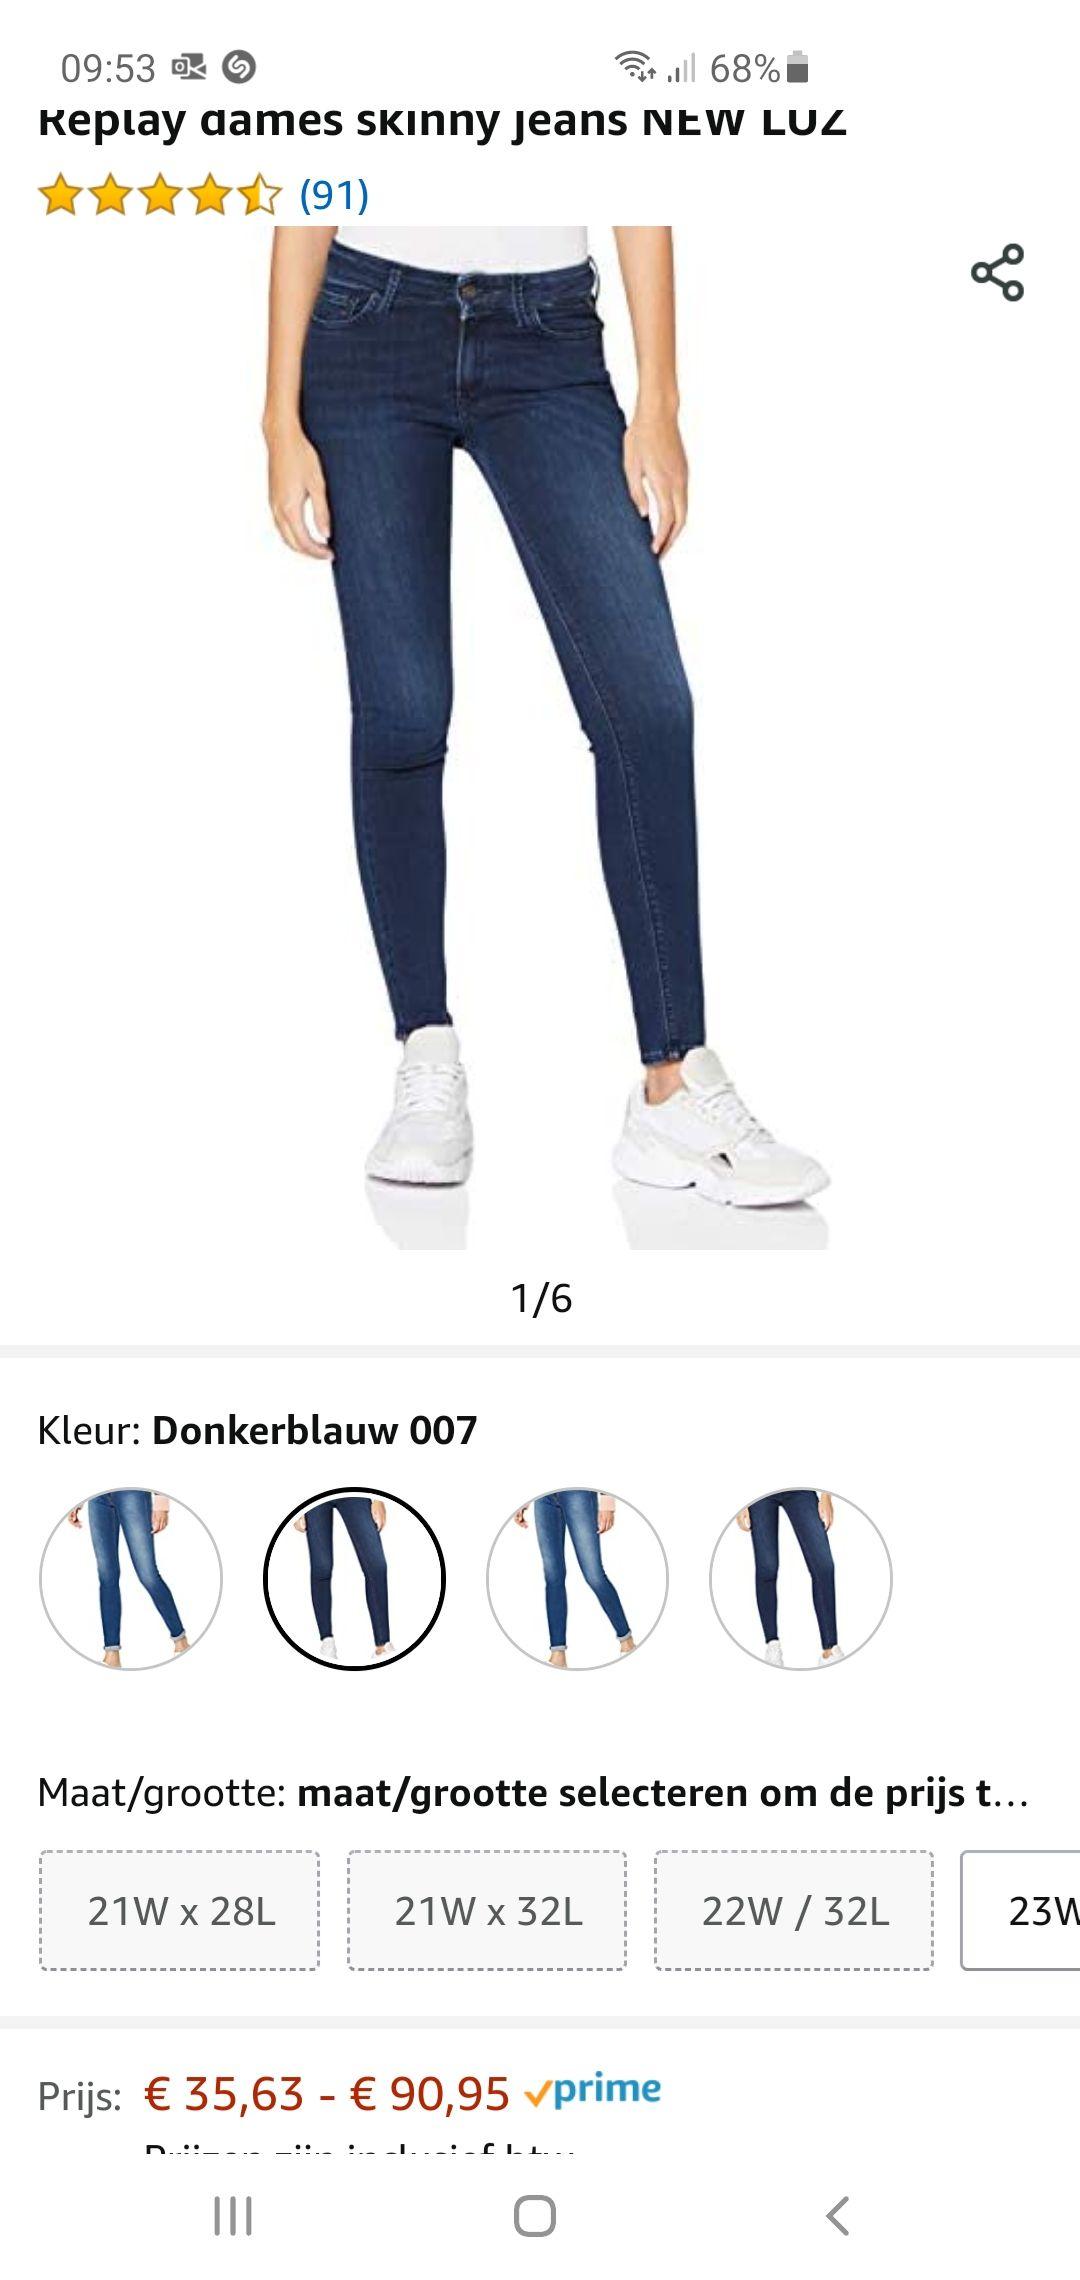 Replay dames skinny jeans NEW LUZ